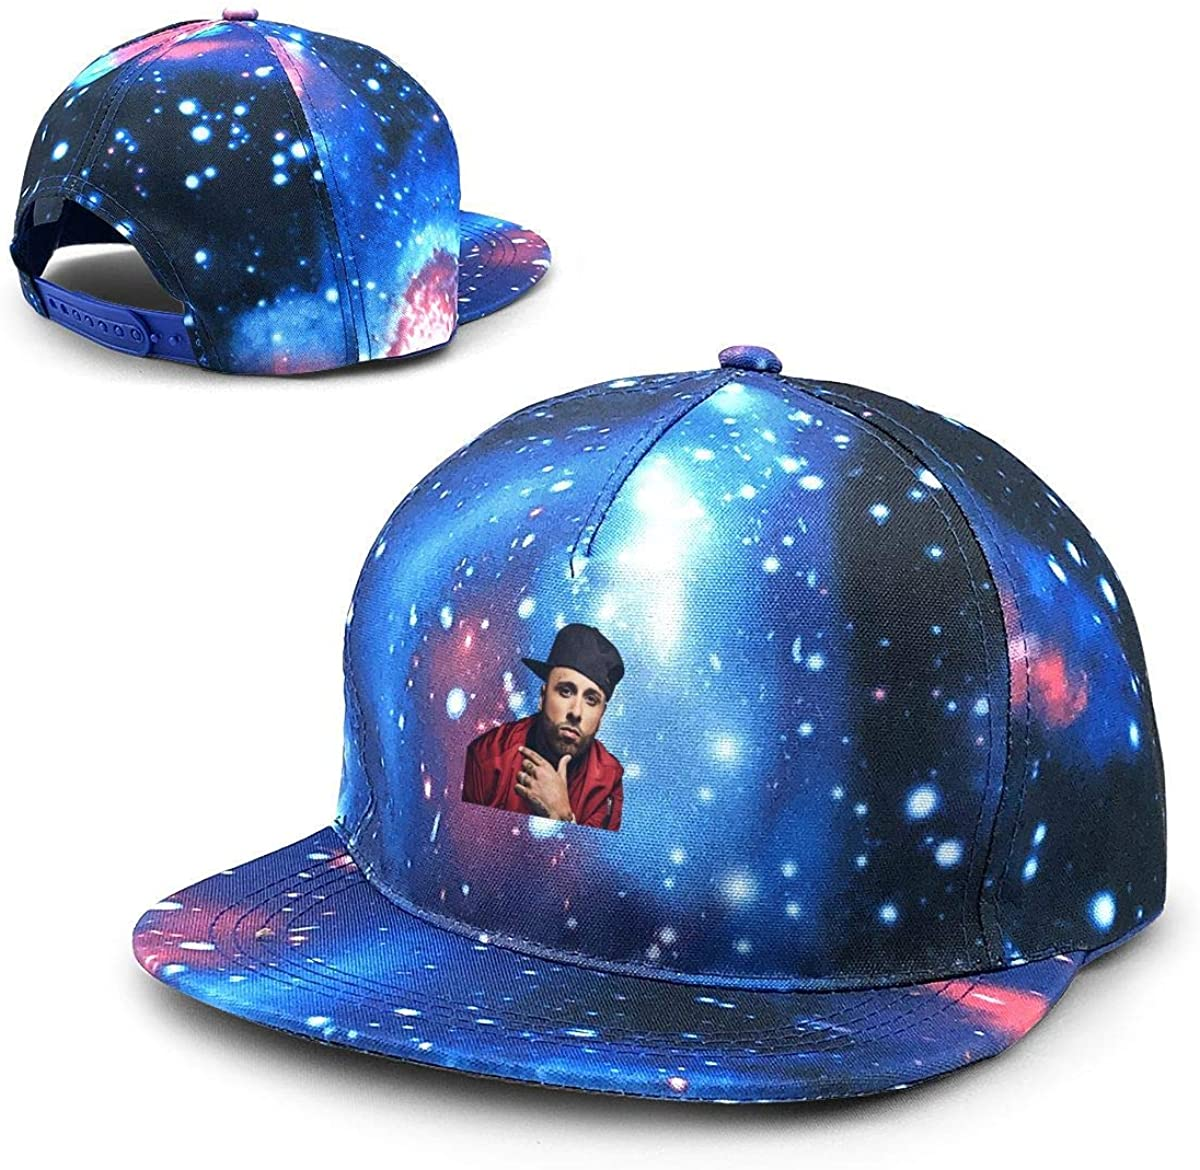 Rogerds Unisex Gorra de béisbol, Sombreros de Verano Nicky Jam ...